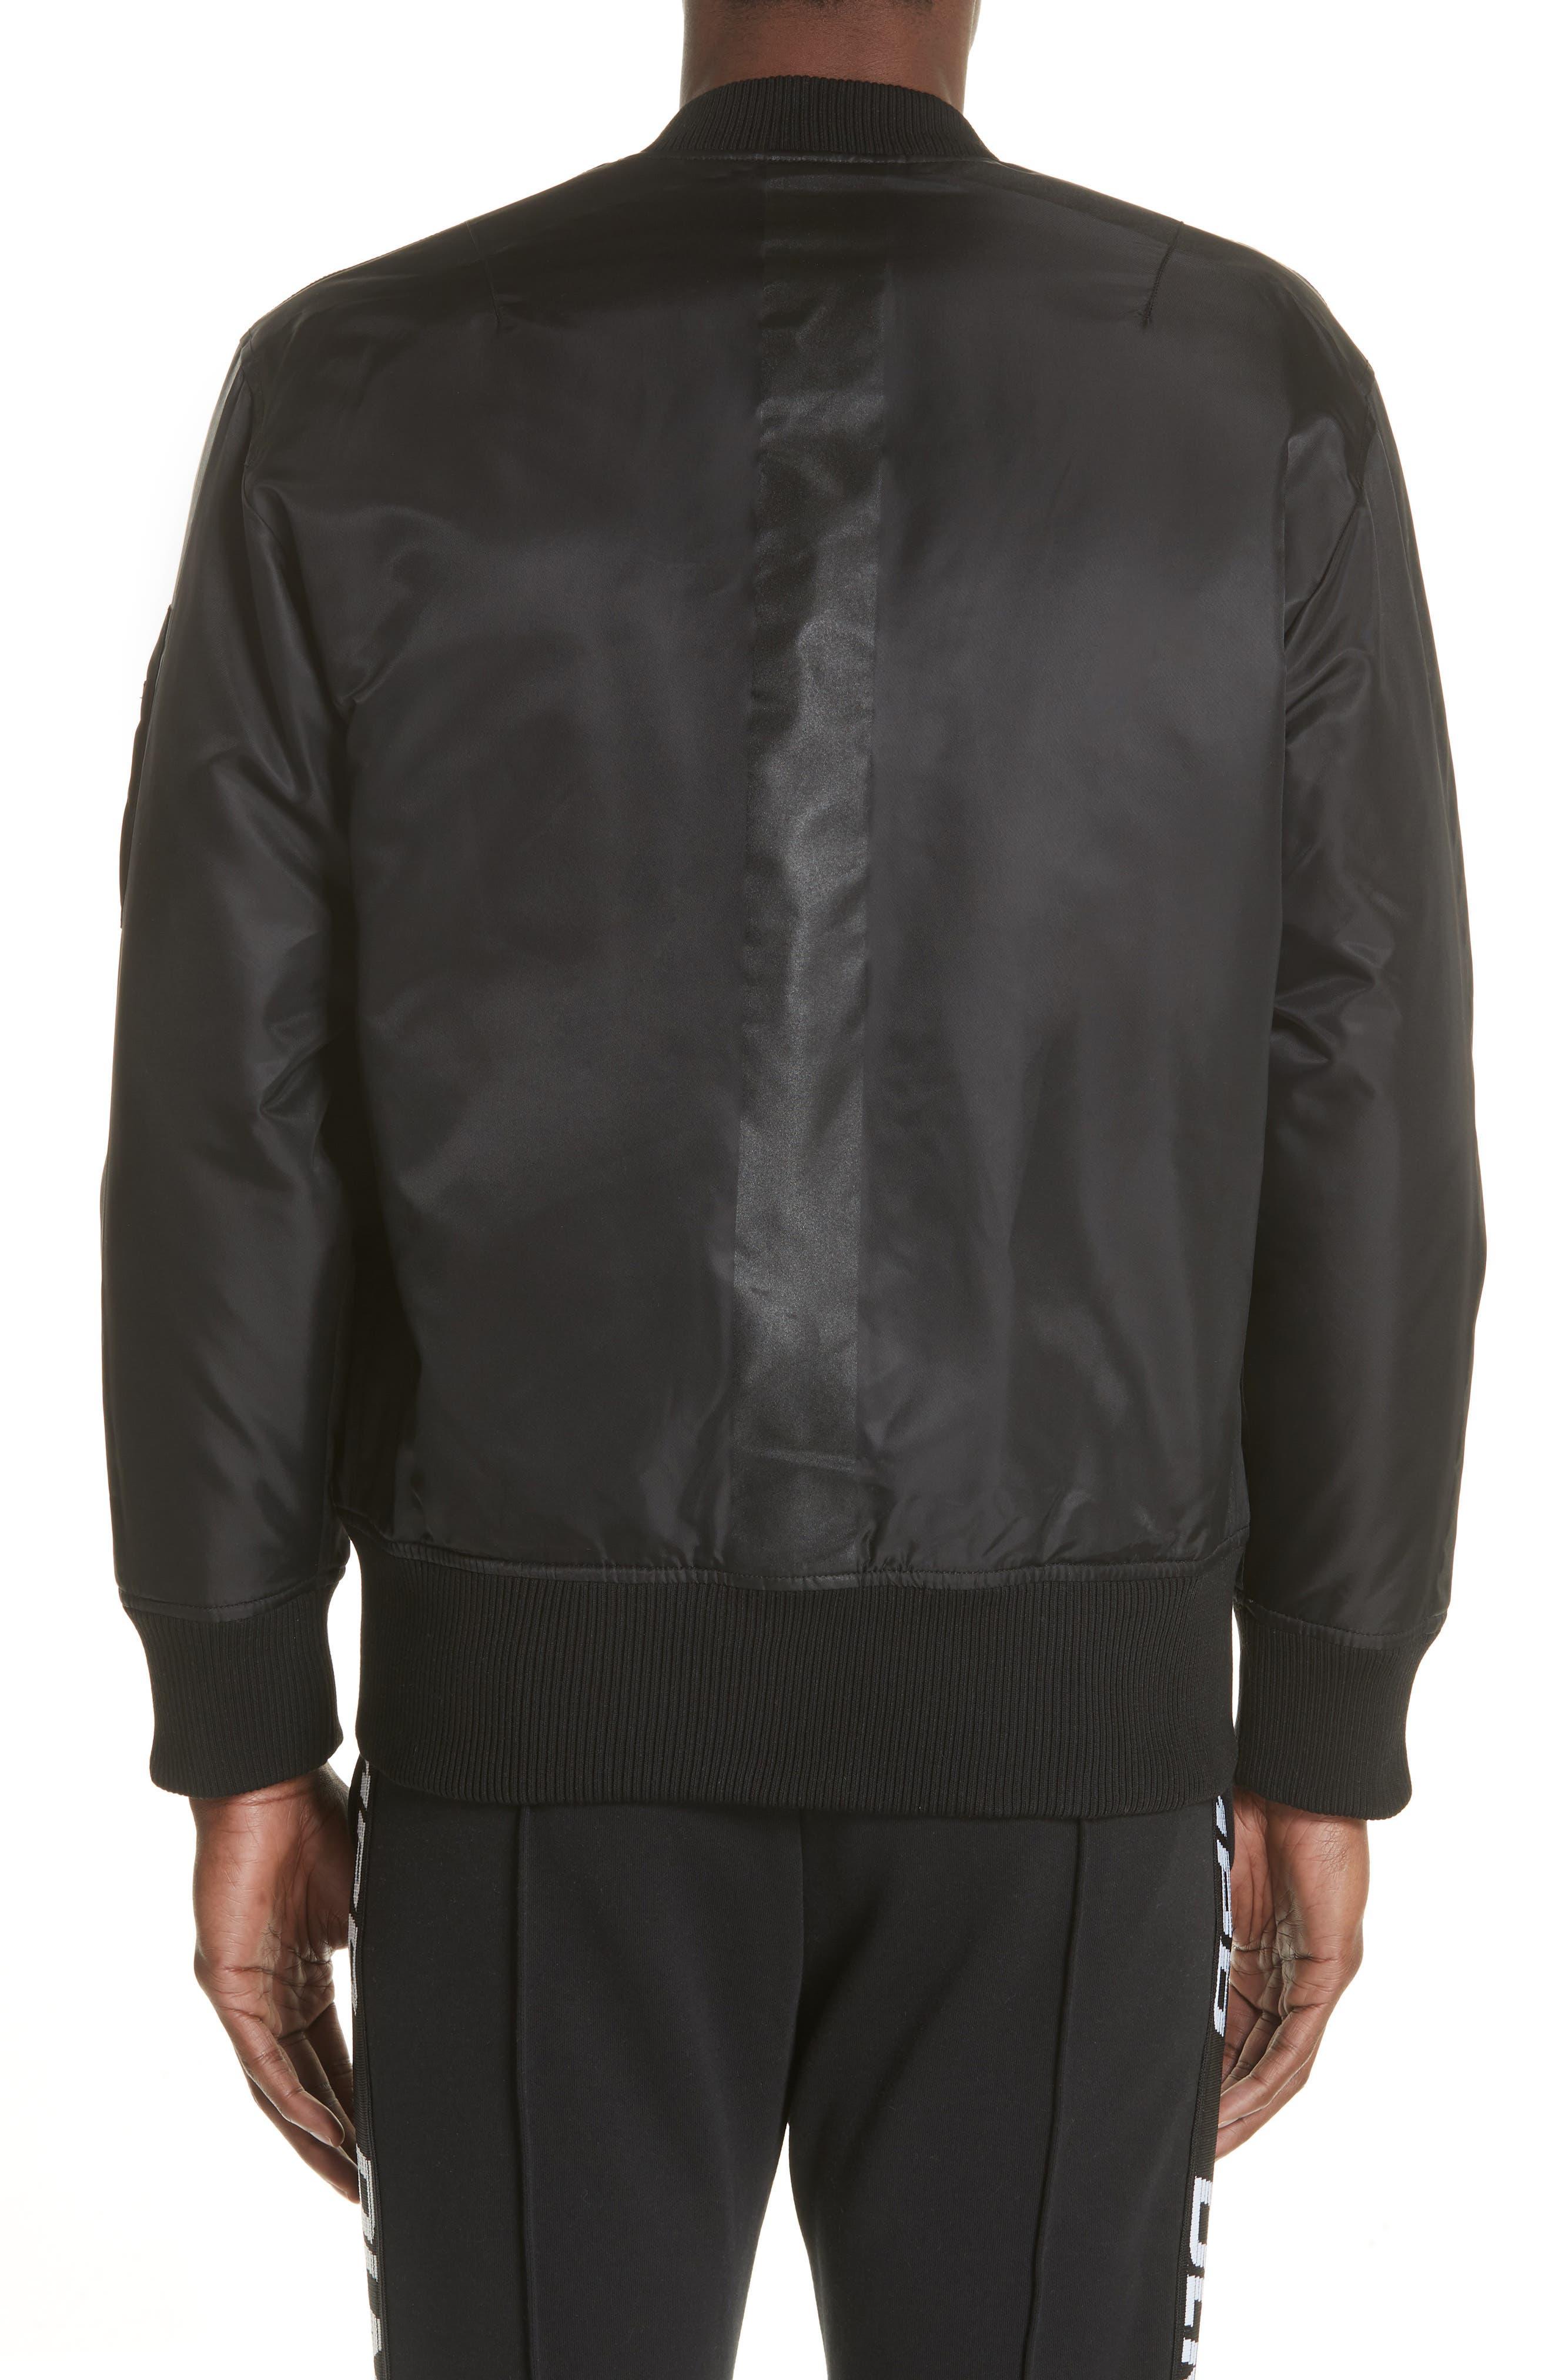 Van Ness Bomber Jacket,                             Alternate thumbnail 2, color,                             BLACK